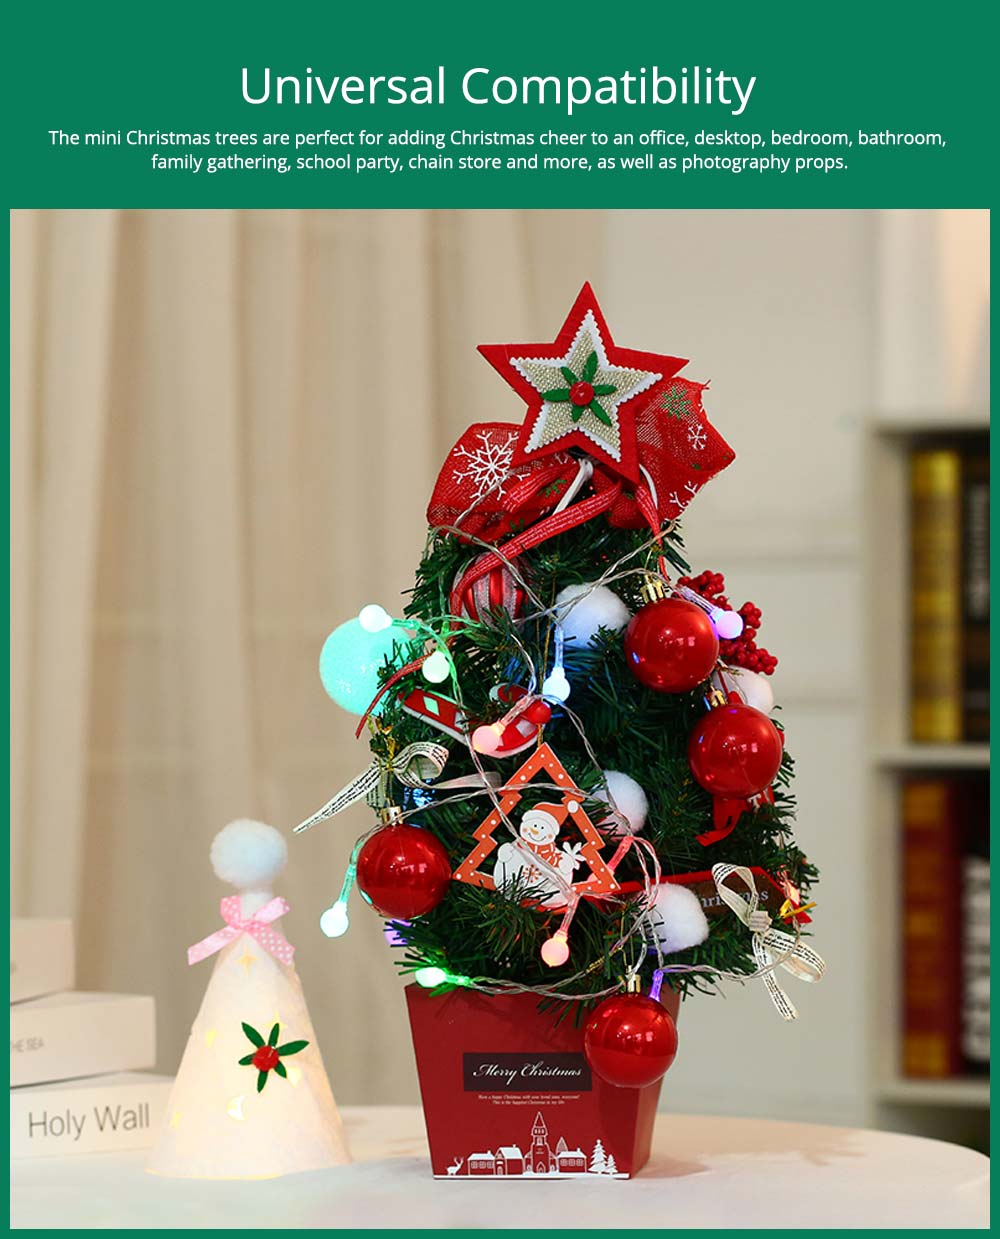 Universal Compatibility Christmas Tree